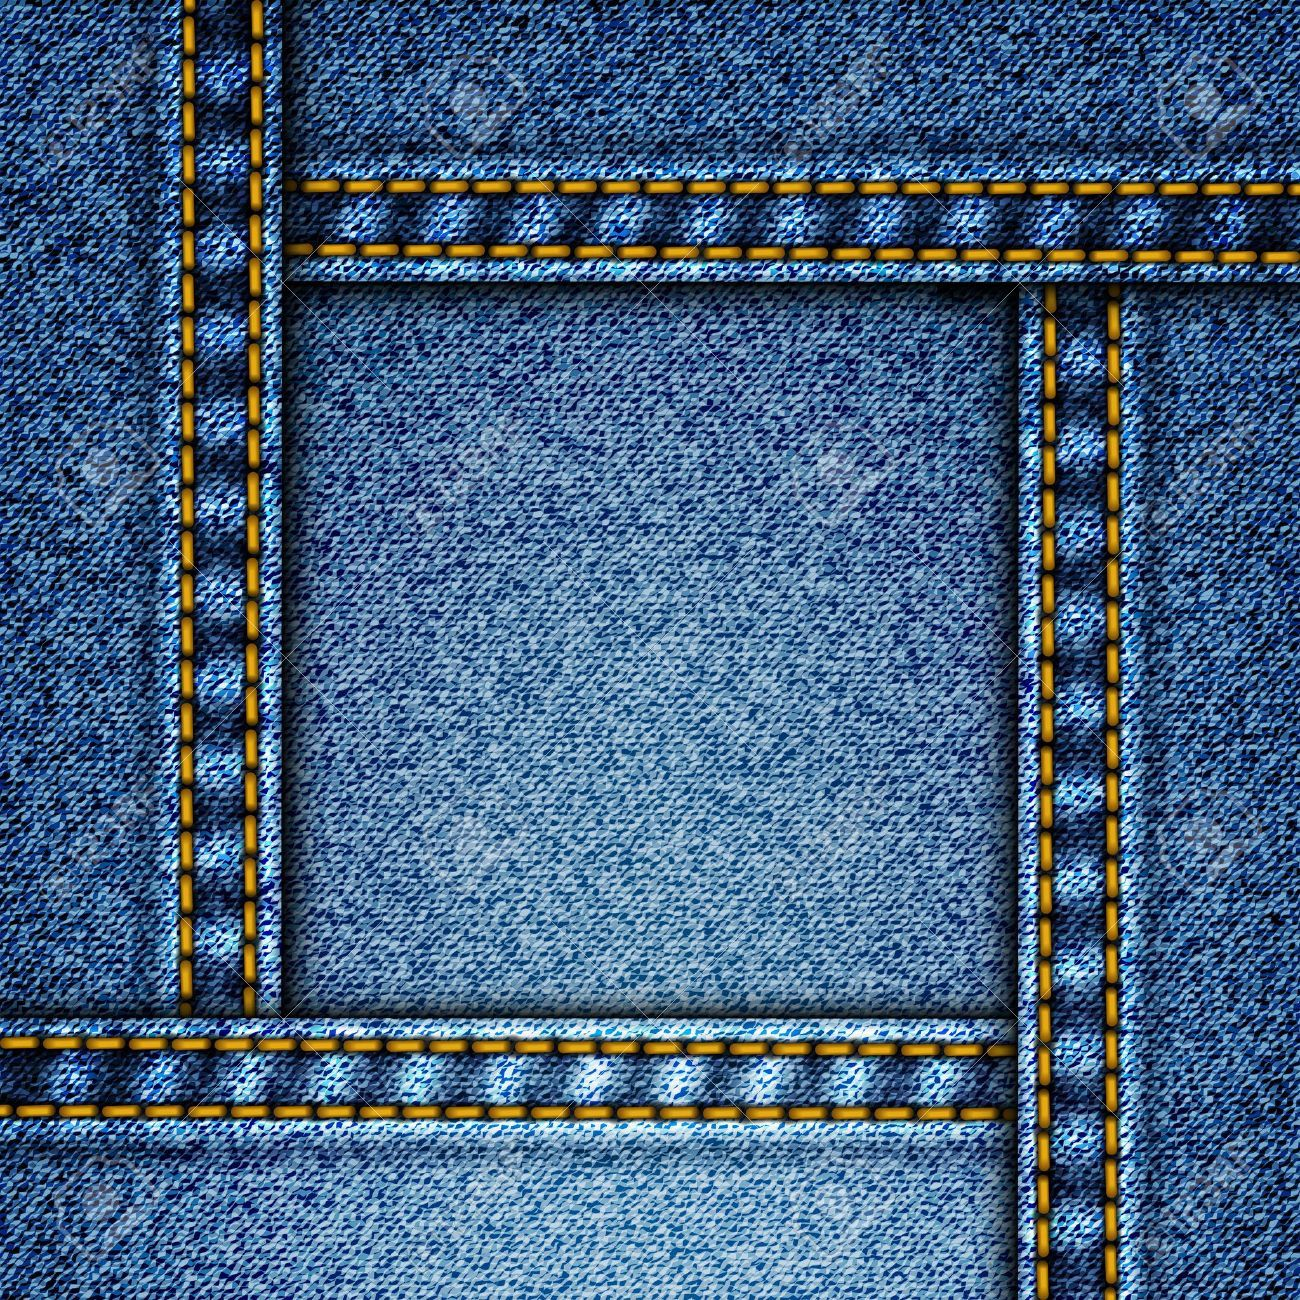 11272021-Realistic-vector-denim-background--Stock-Vector-jeans-denim.jpg (1300×1300)